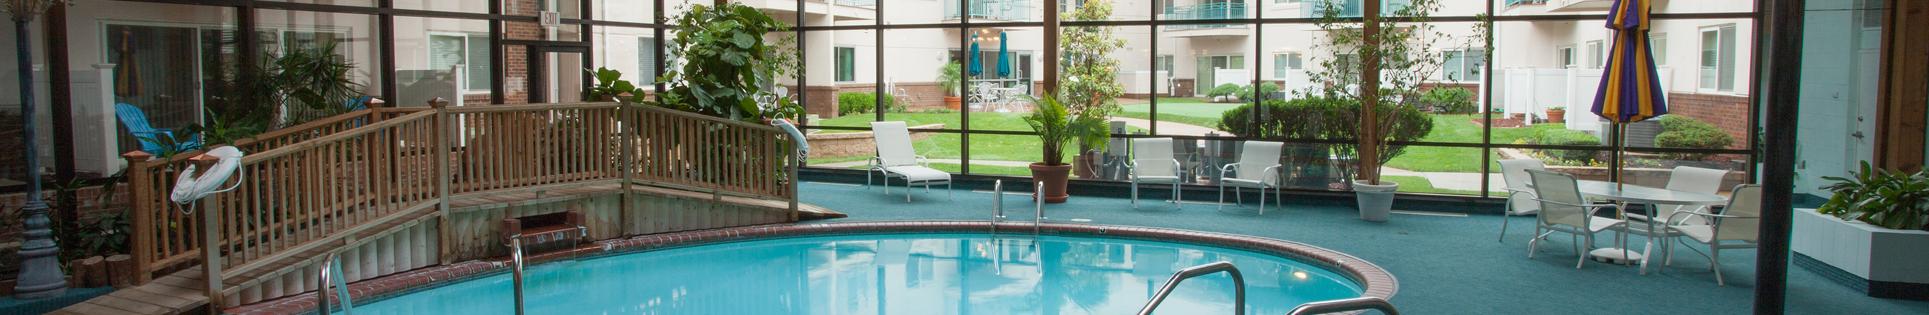 St Louis Retirement Communities Garden Villas